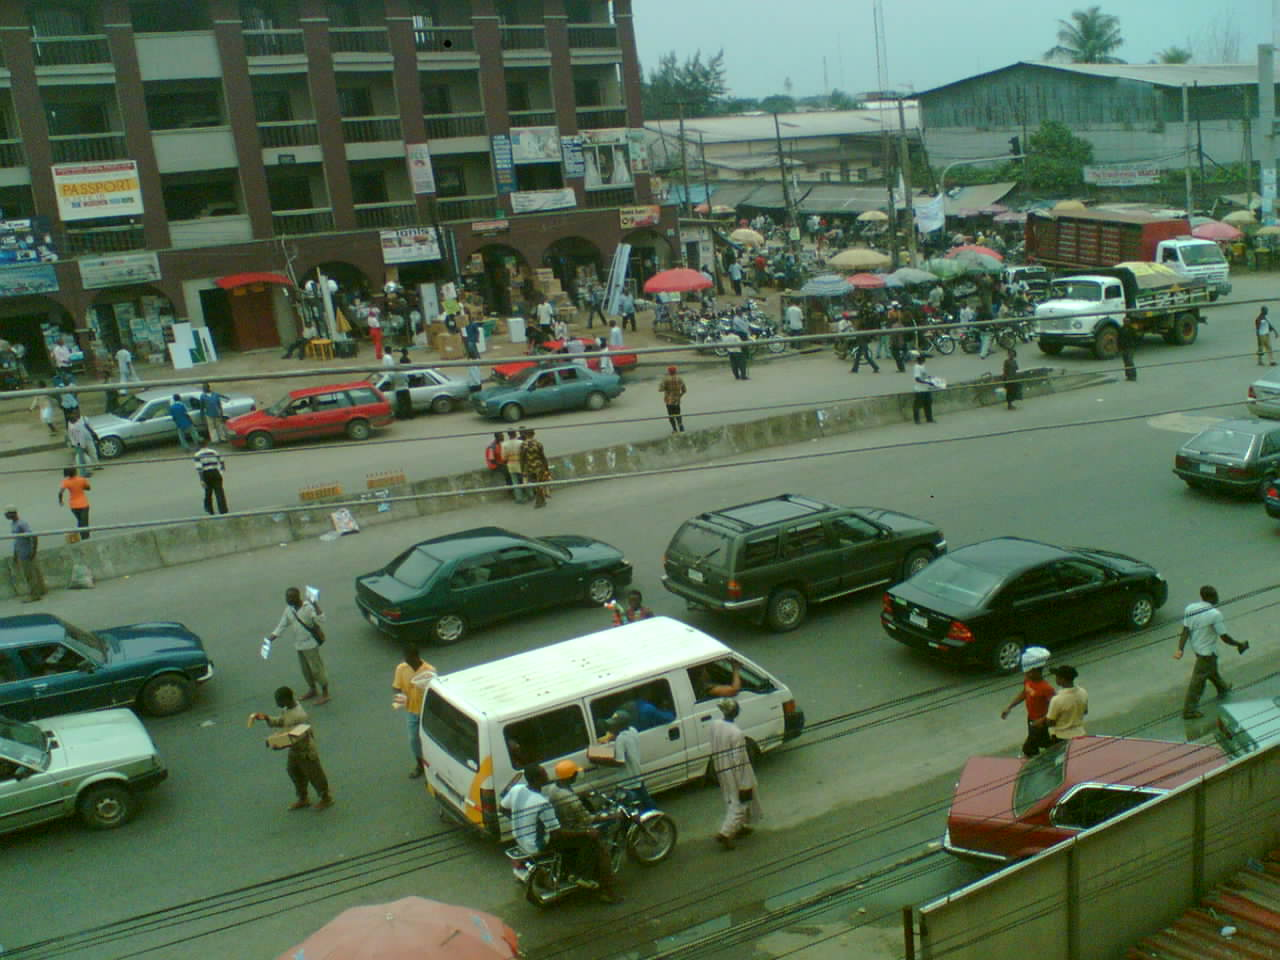 Port Harcourt street scene (Photo by Utibe4you via Wikimedia Commons)